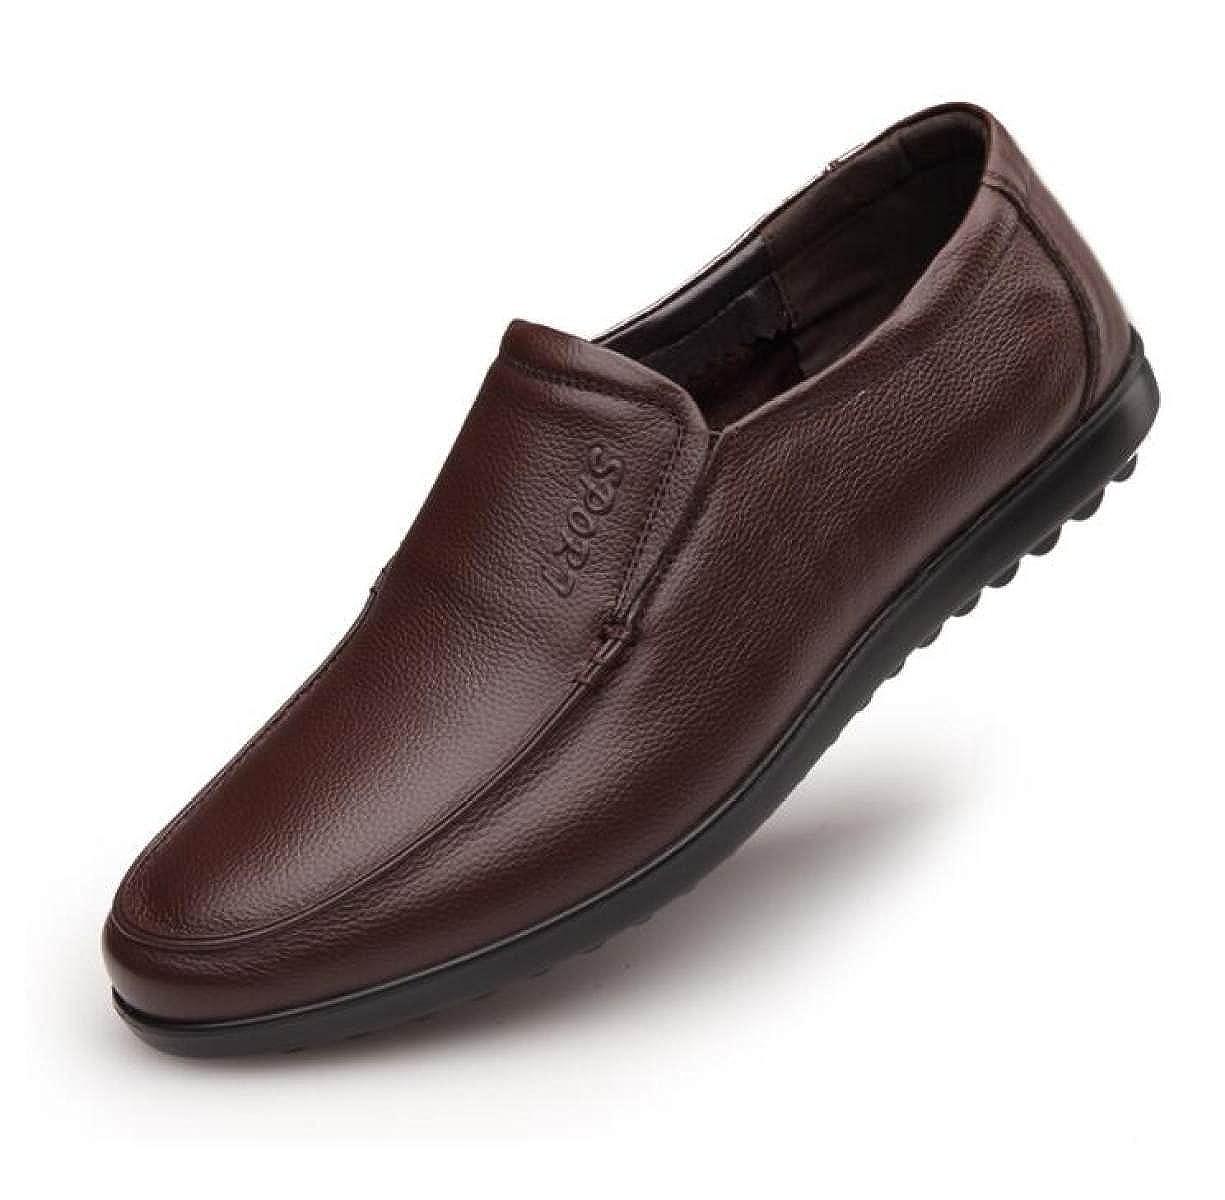 Männer Männer Freizeitschuhe Leder Weichen Boden Schuhe Mittleren Braun Alters Papa Schuhe Baumwollschuhe Braun Mittleren cd8787